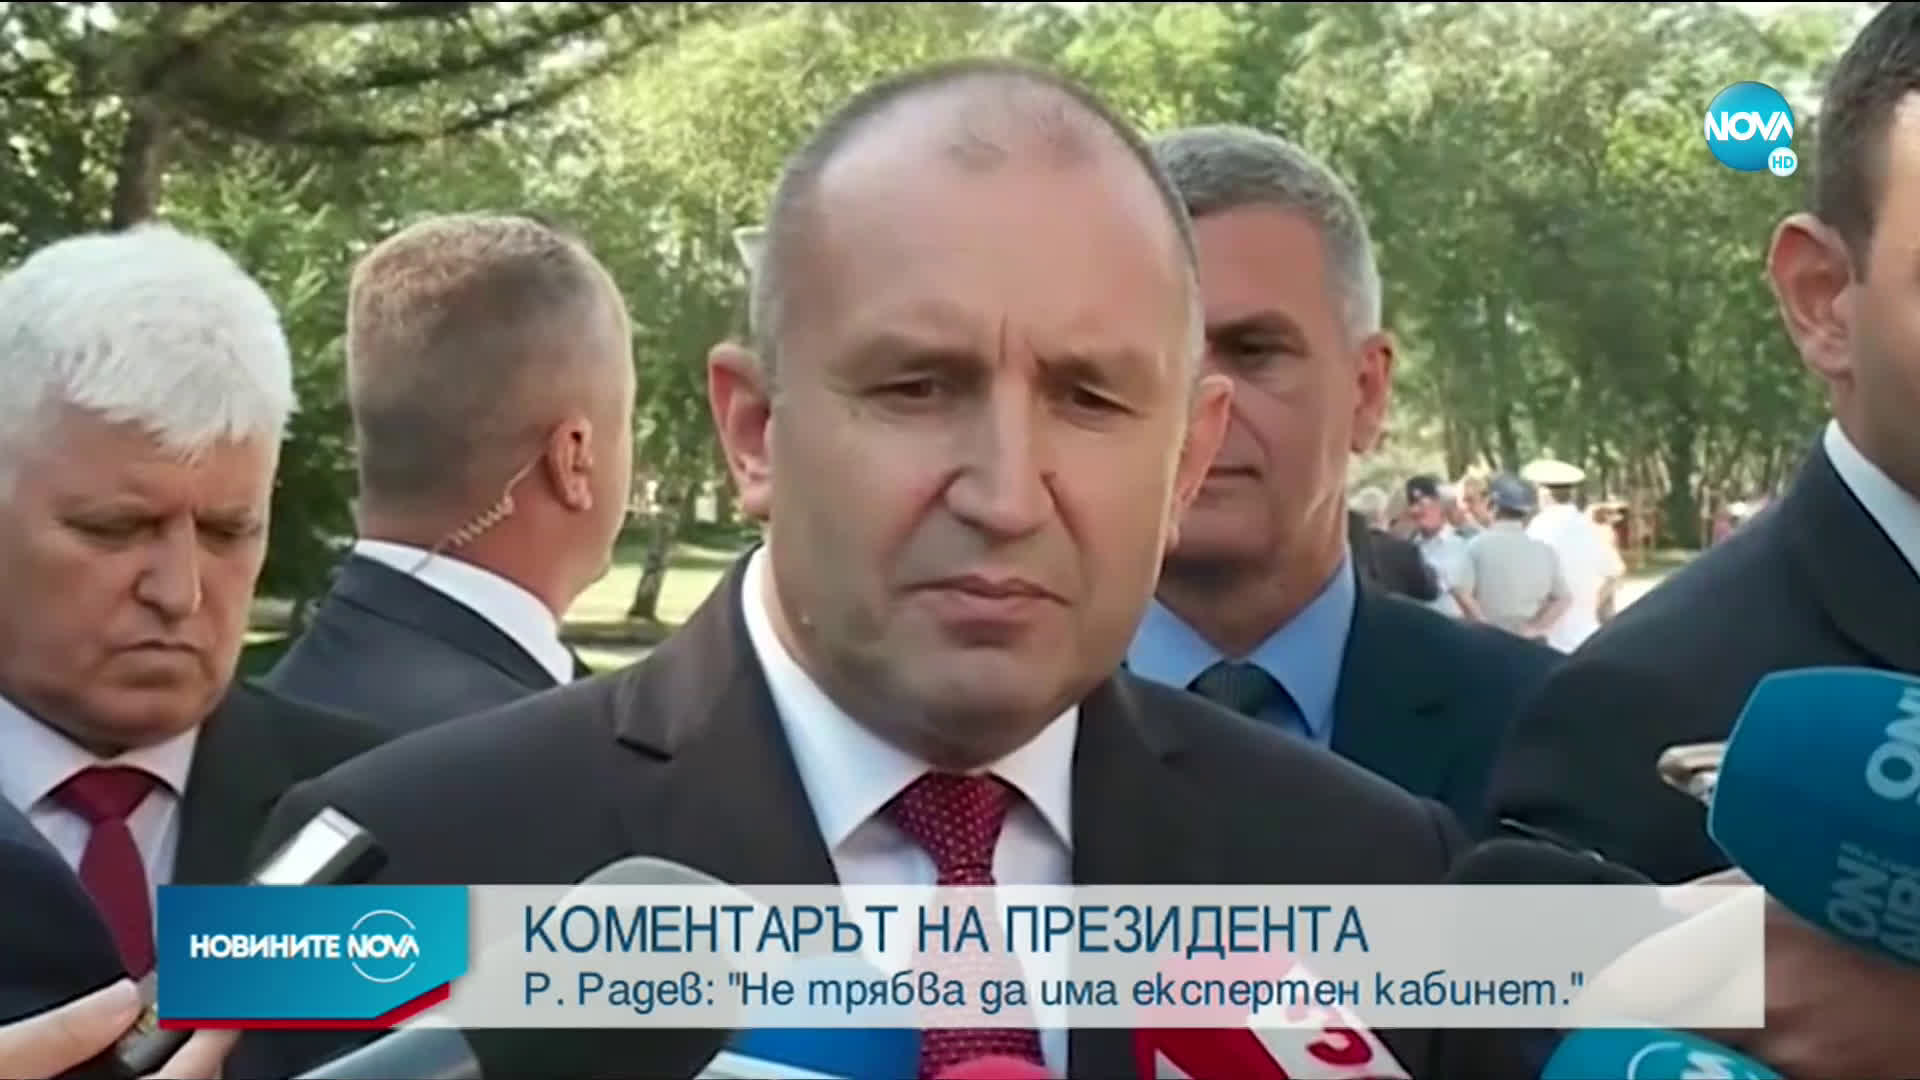 Радев: Имам готов вариант за конституция